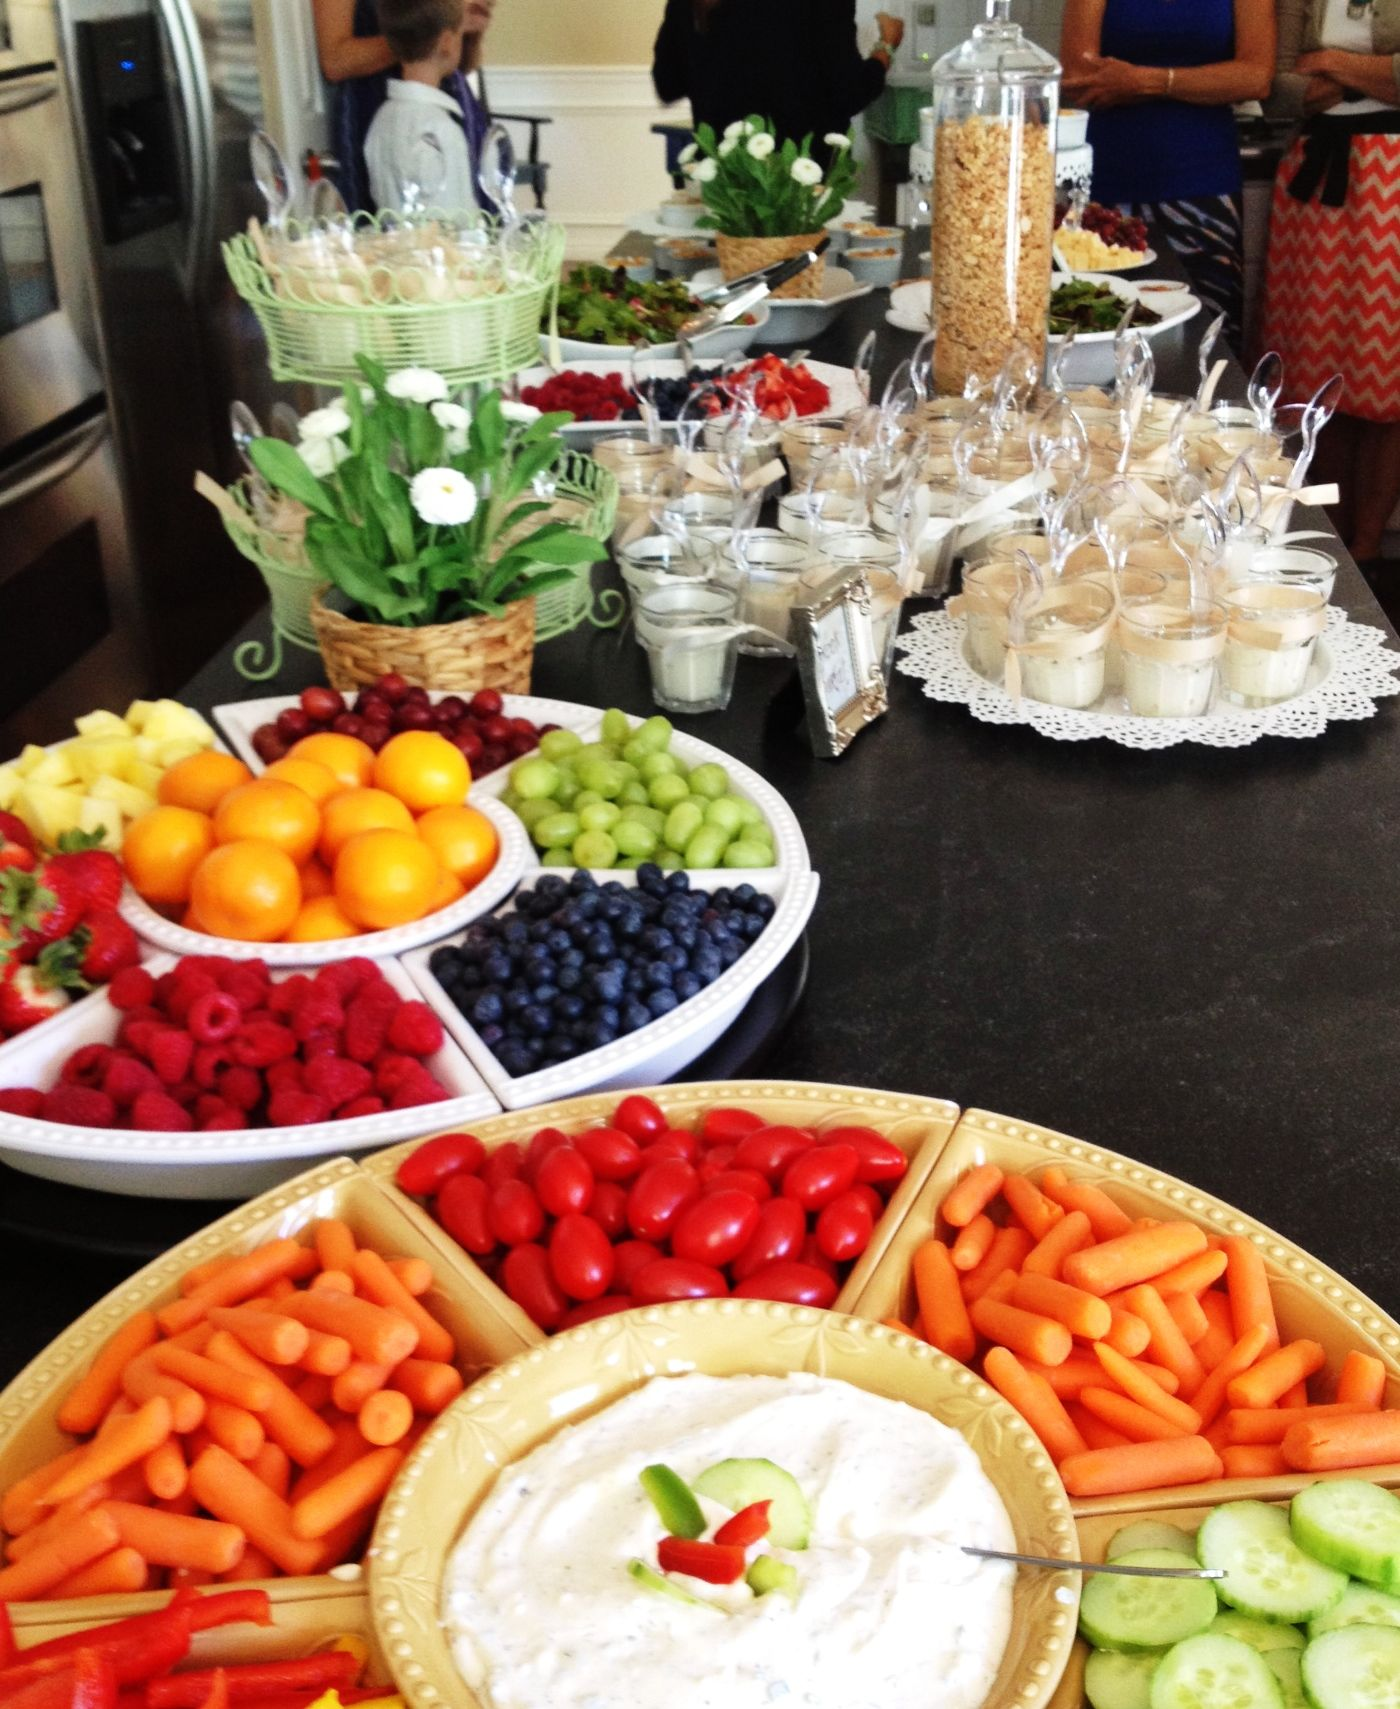 Gotta have fruits and veggies